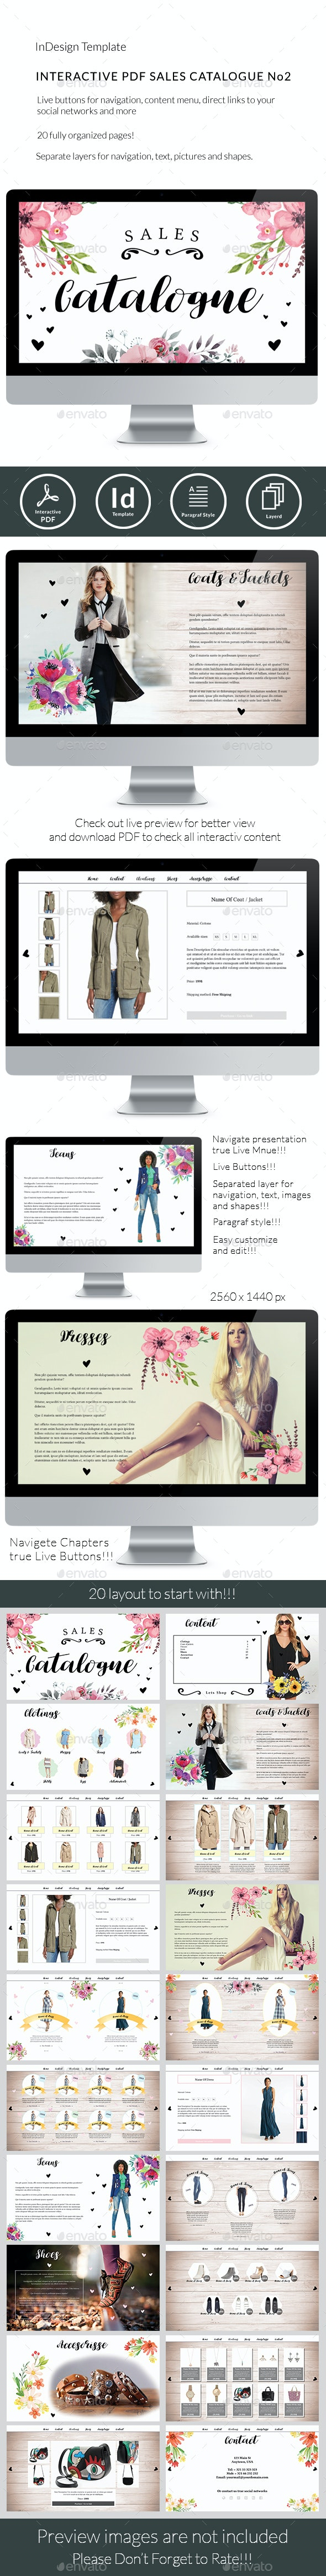 Interactive PDF Catalogue No2